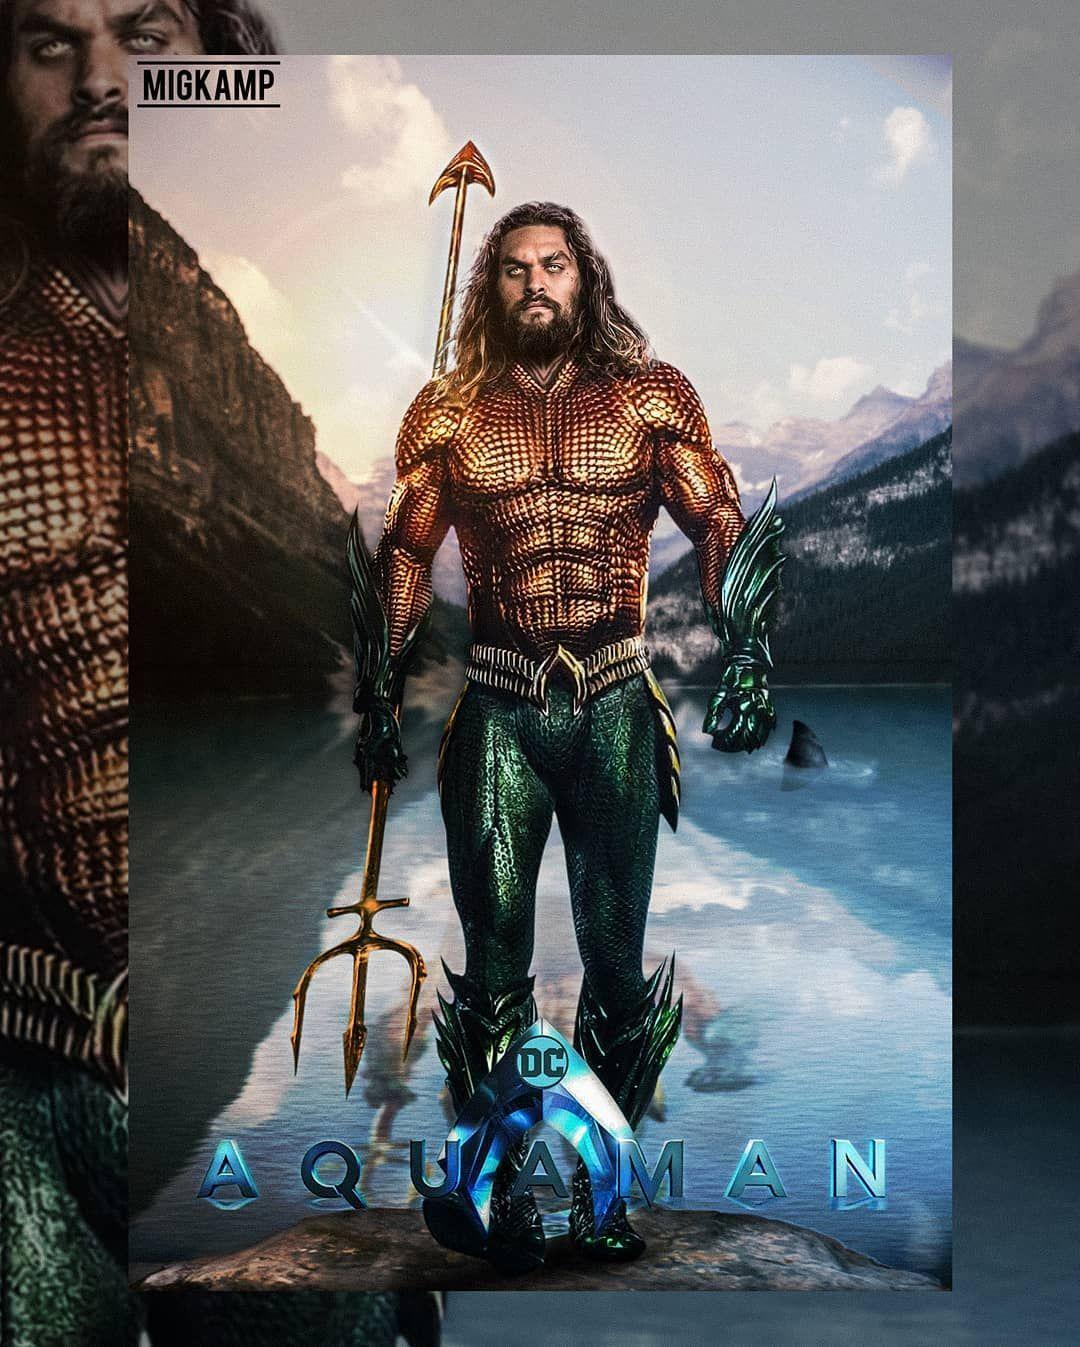 Godzilla 2 Imax Poster Textless: Trends International AquamanTrident Wall Poster 22375quot X 34